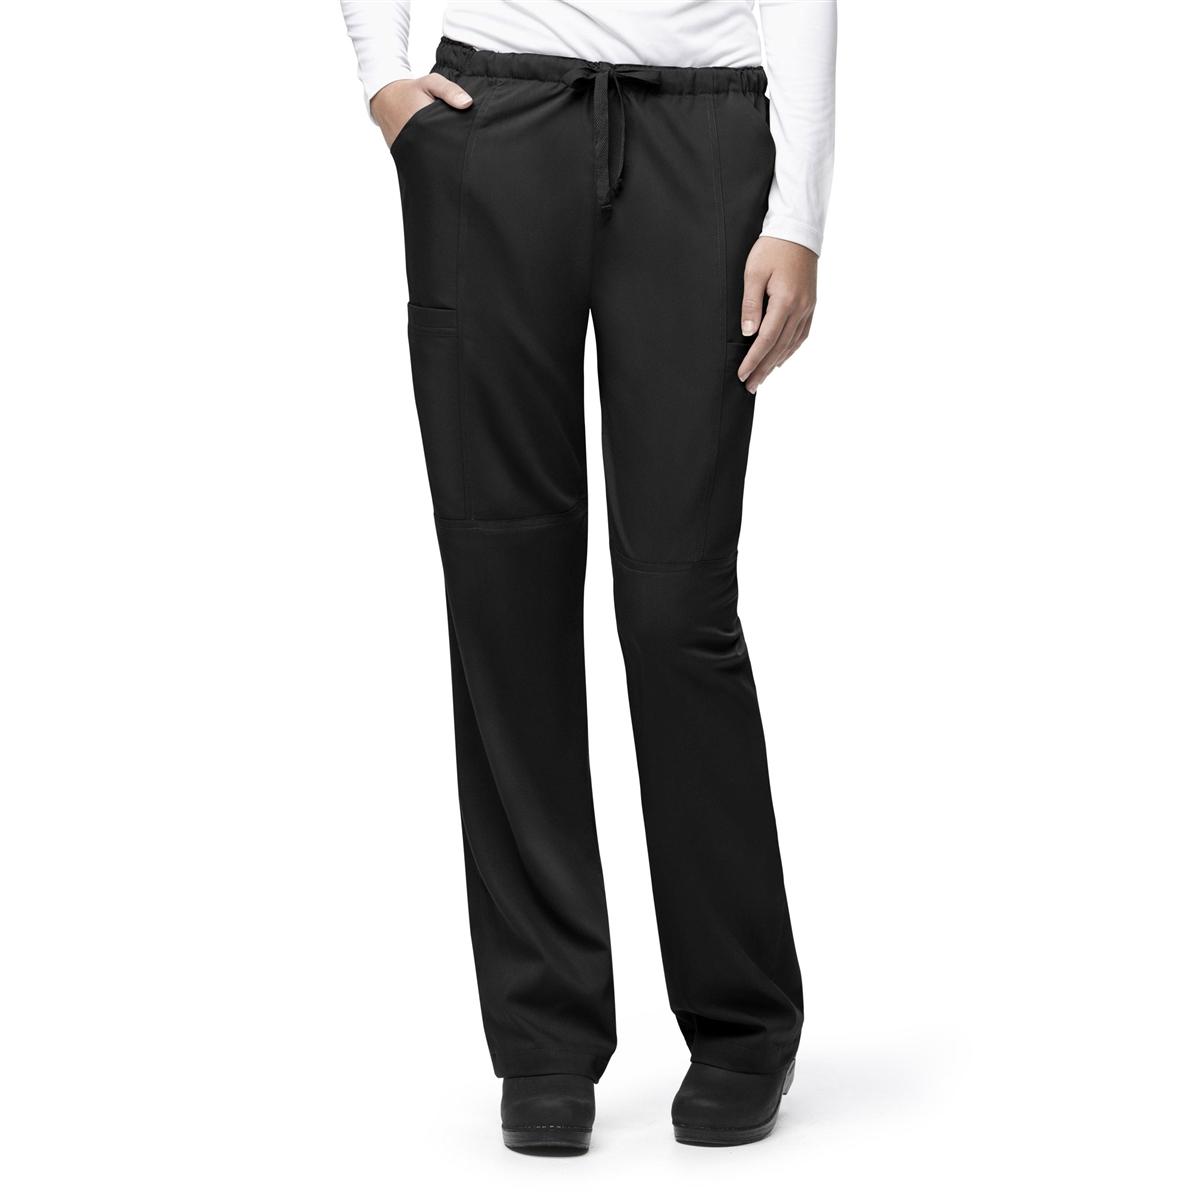 Unique Carhartt Women39s Cargo Pants Size 18 X 32 Tan Carhartt Cargo